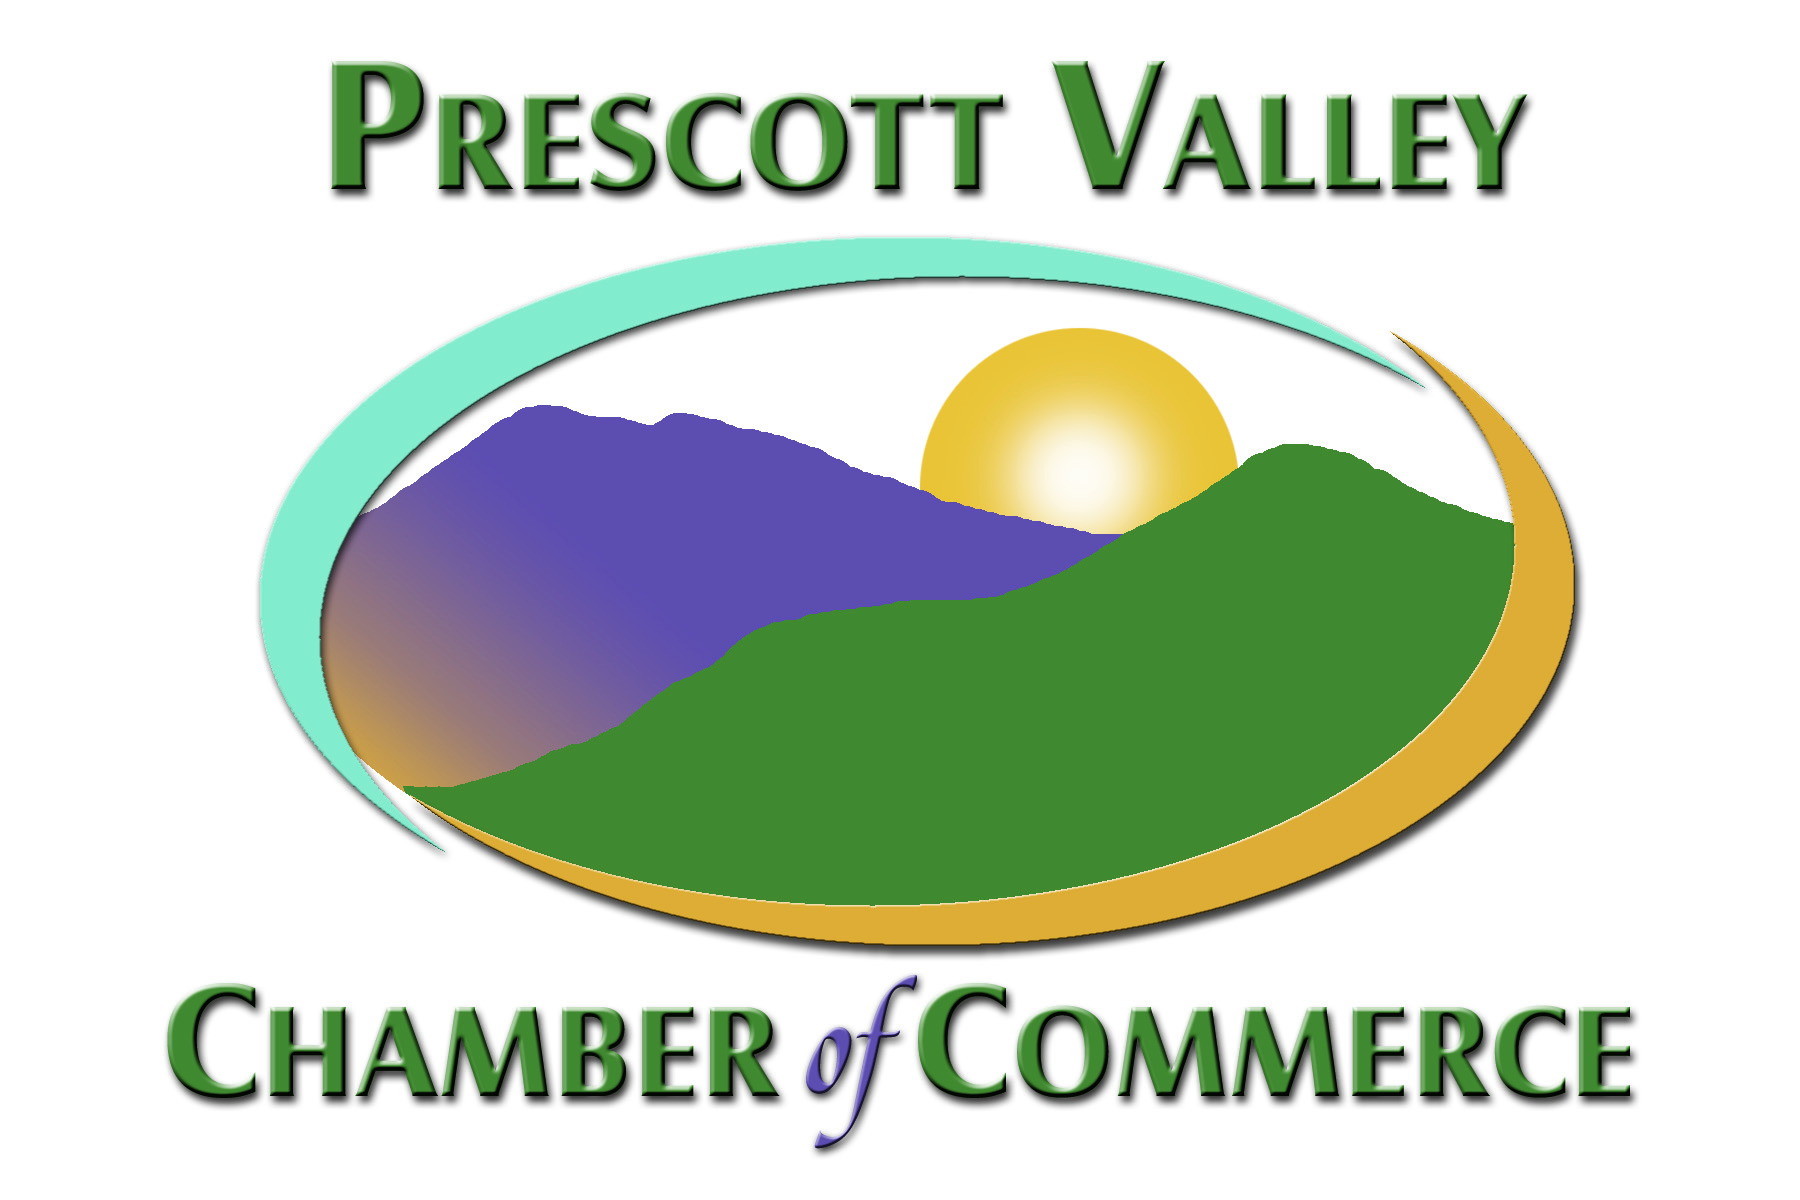 Prescott Valley Chamber of Commerce